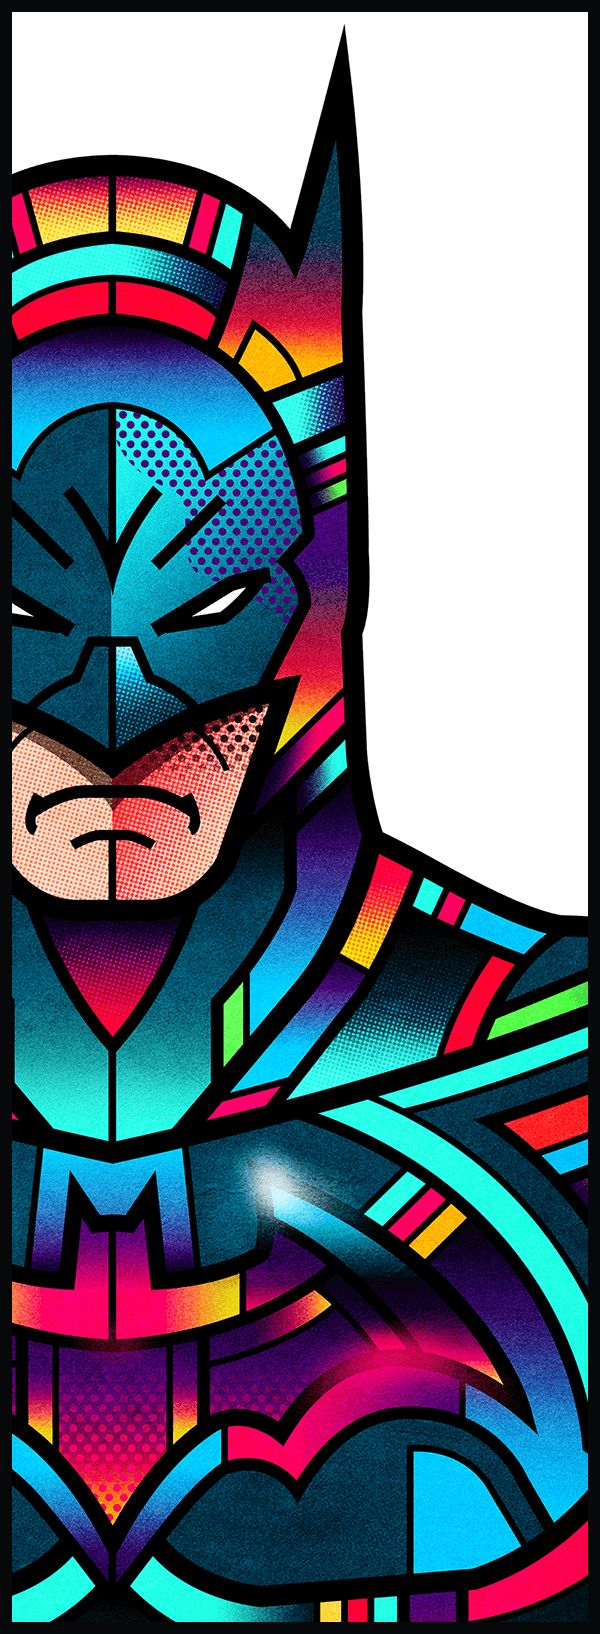 Van Orton Design (http://vanortondesign.com/wondercon2015)